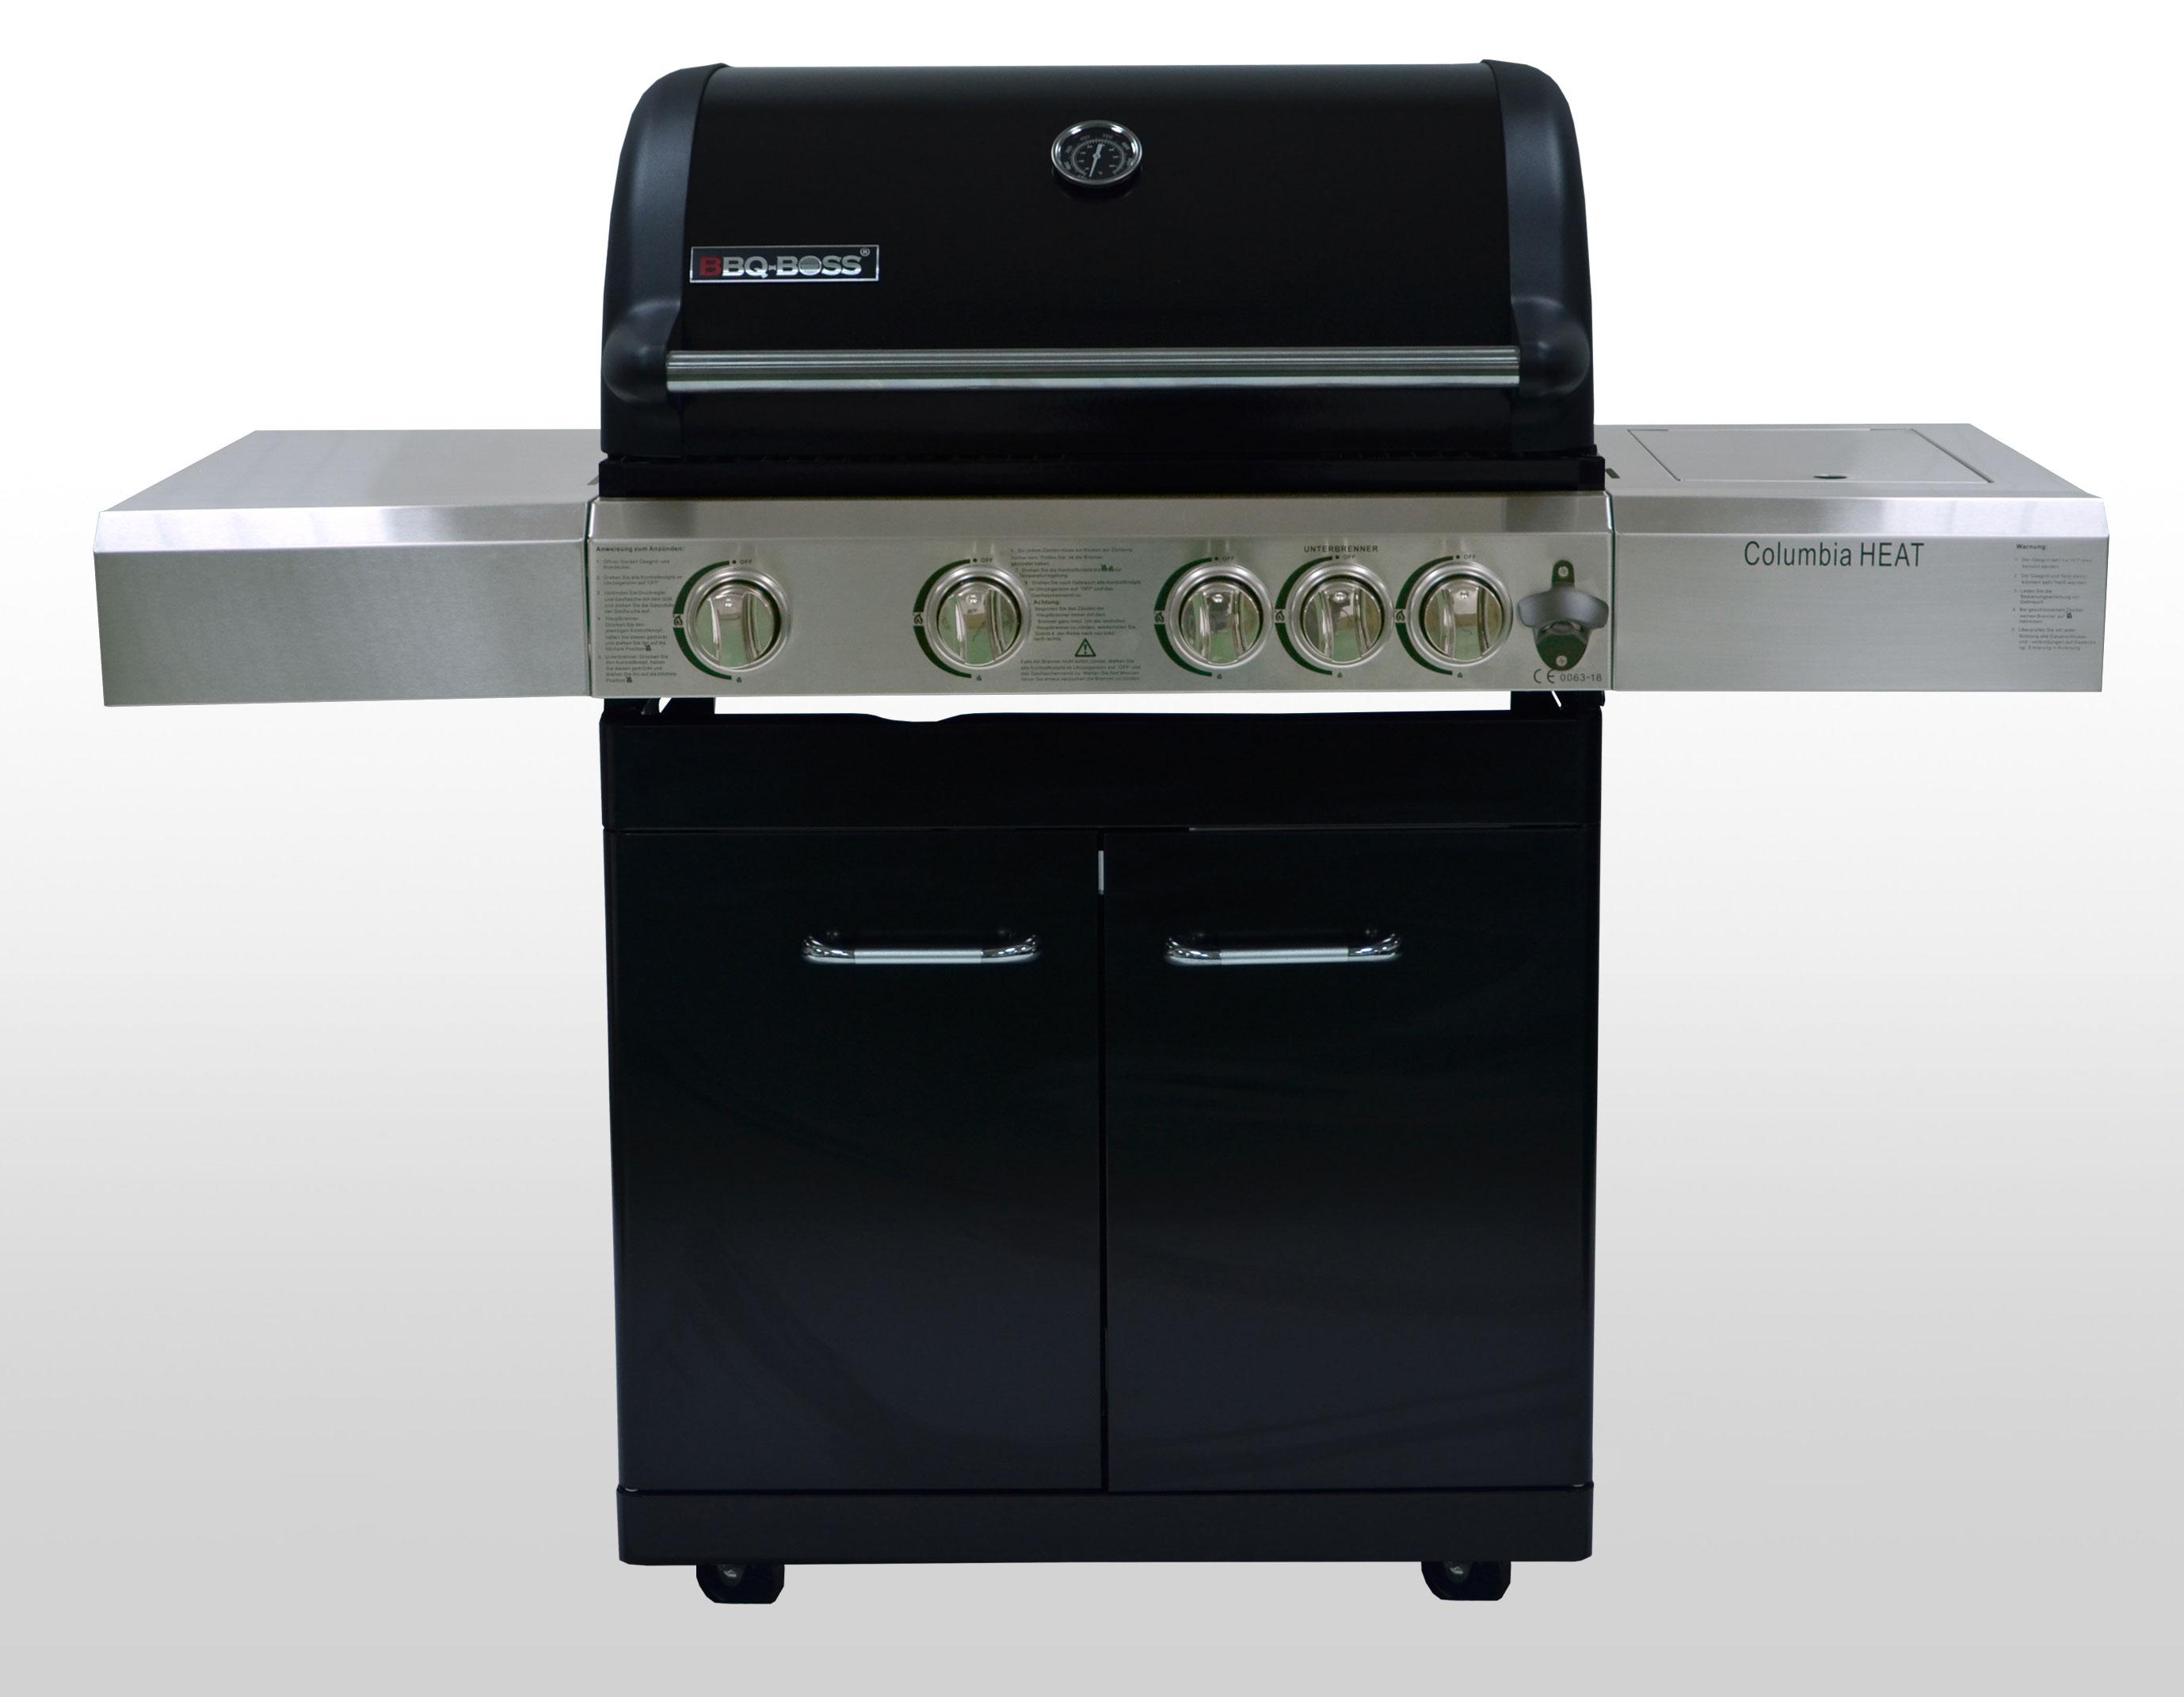 Gasgrill / Grillwagen BBQ Boss Columbia Heat Grillfläche 74x46cm Bild 1